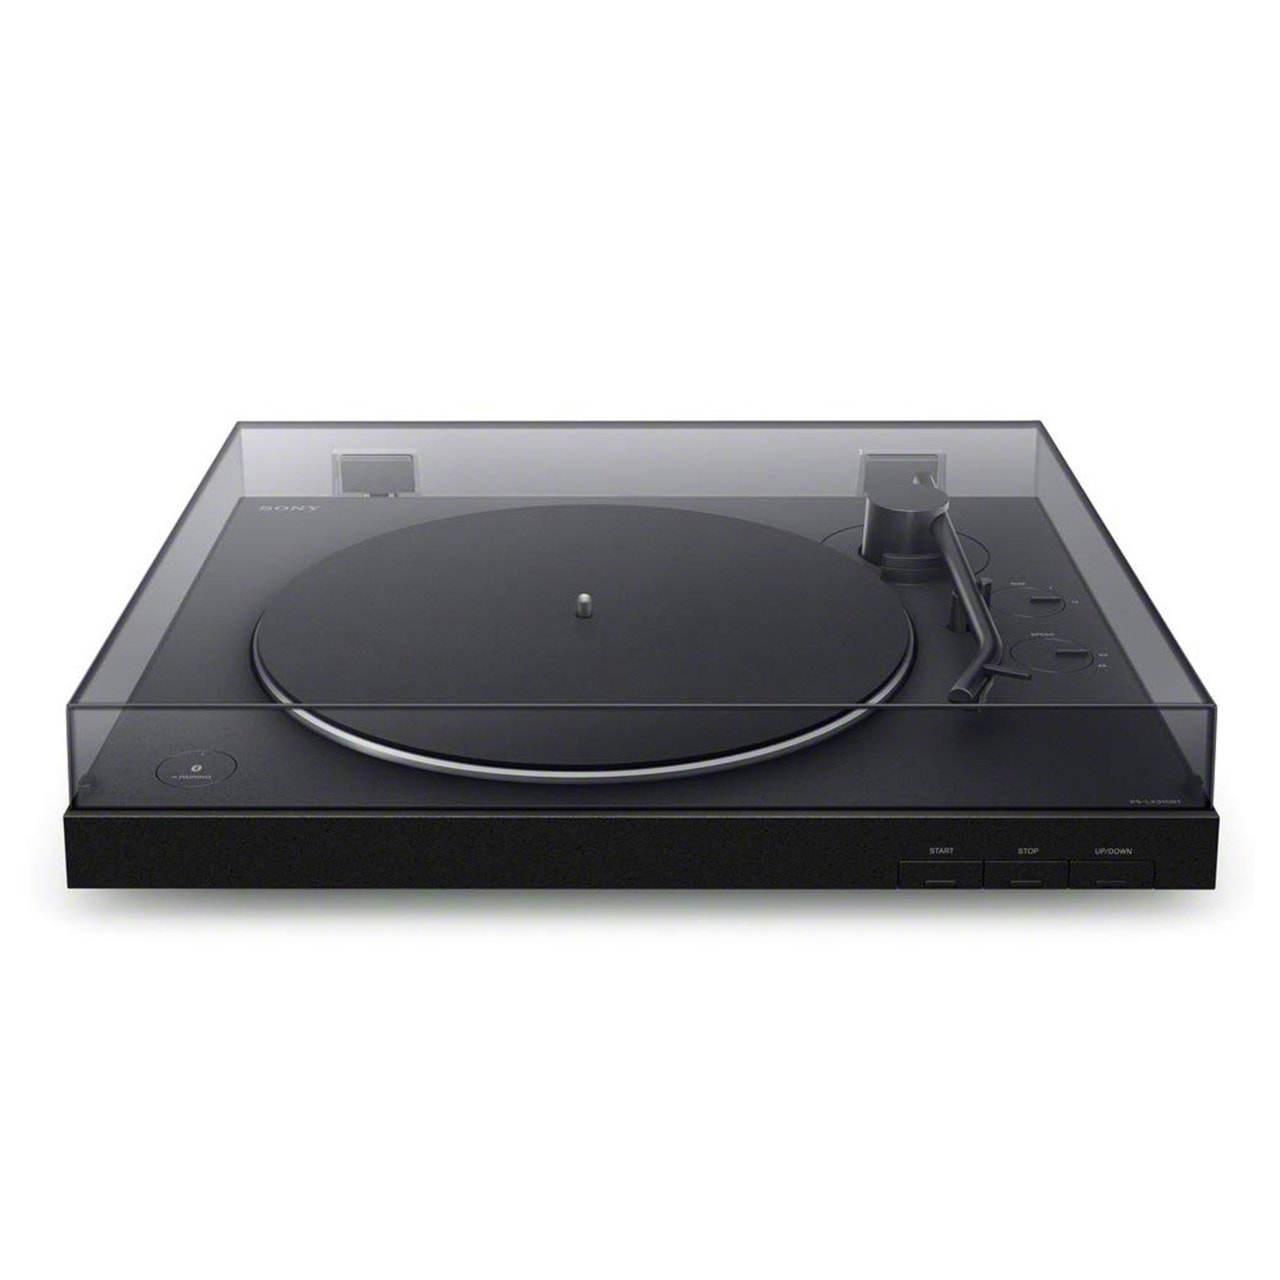 Sony PSLX310BT Bluetooth Turntable - 1